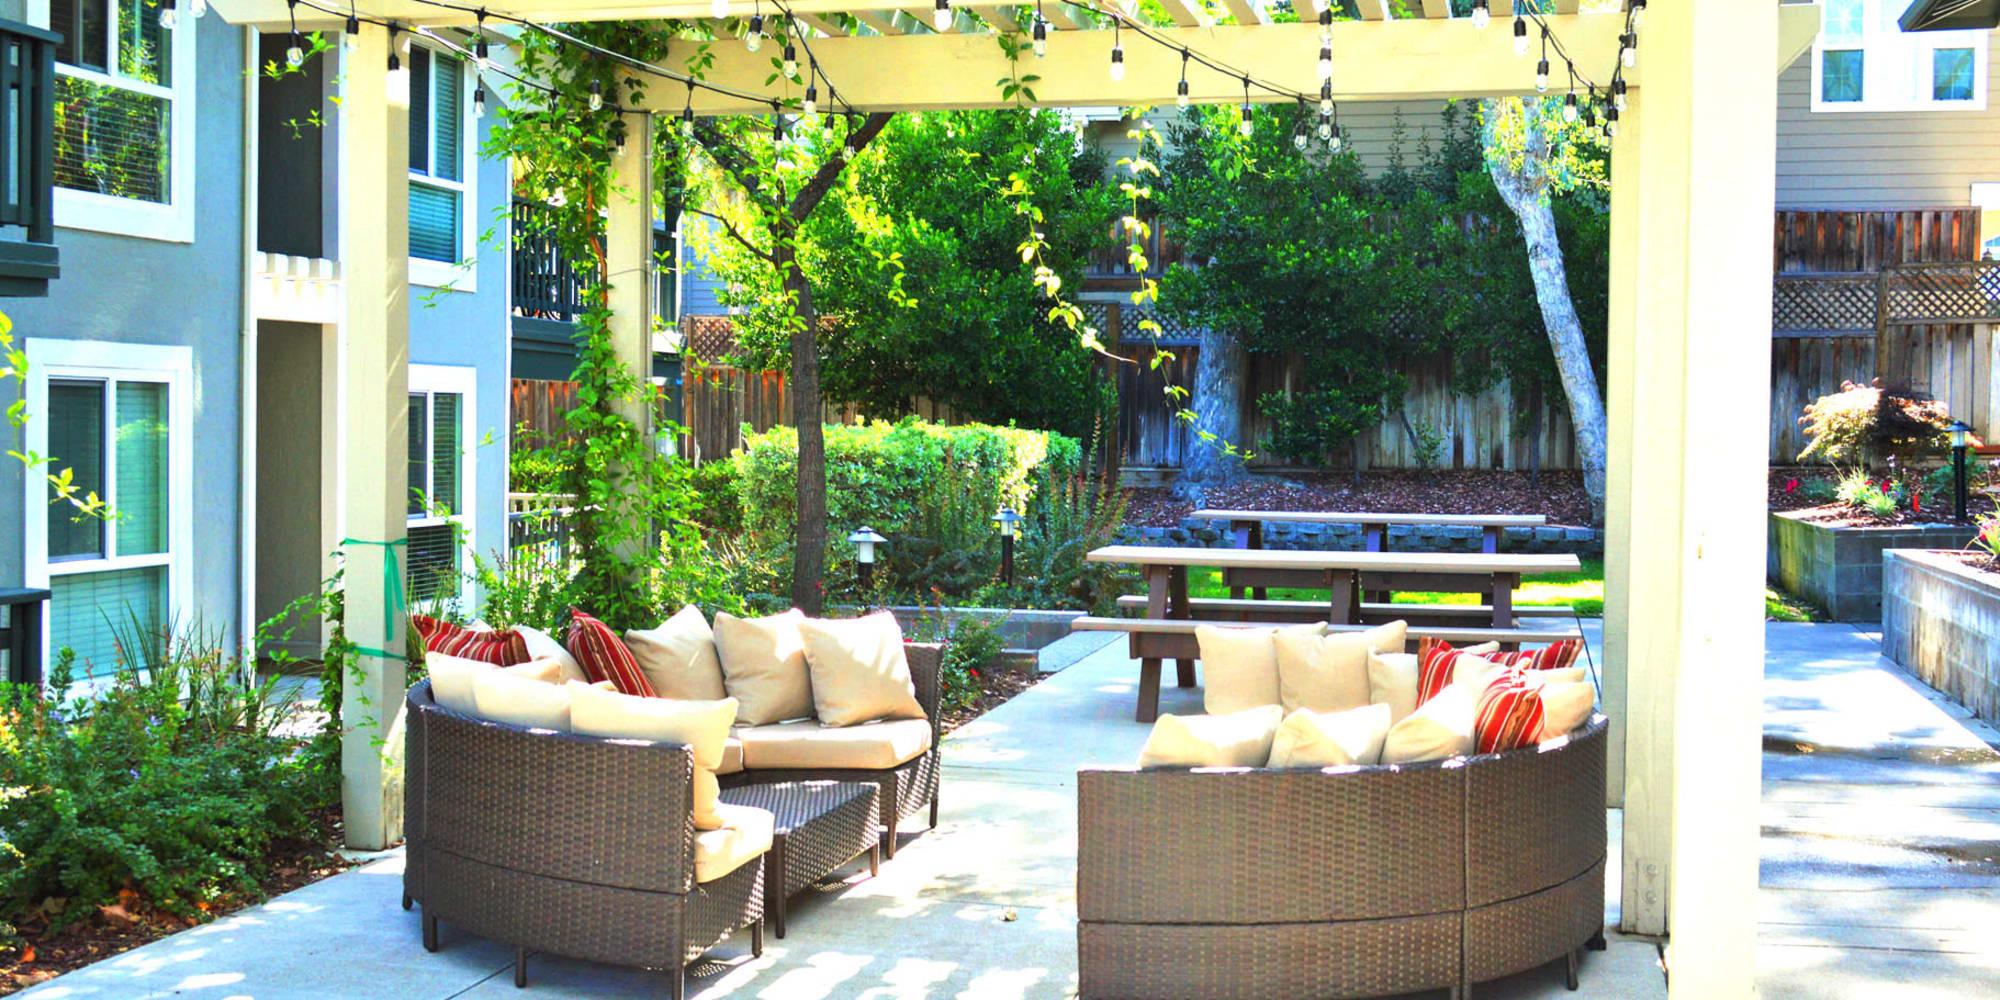 Comfortable seating at an outdoor lounge area at Pleasanton Glen Apartment Homes in Pleasanton, California